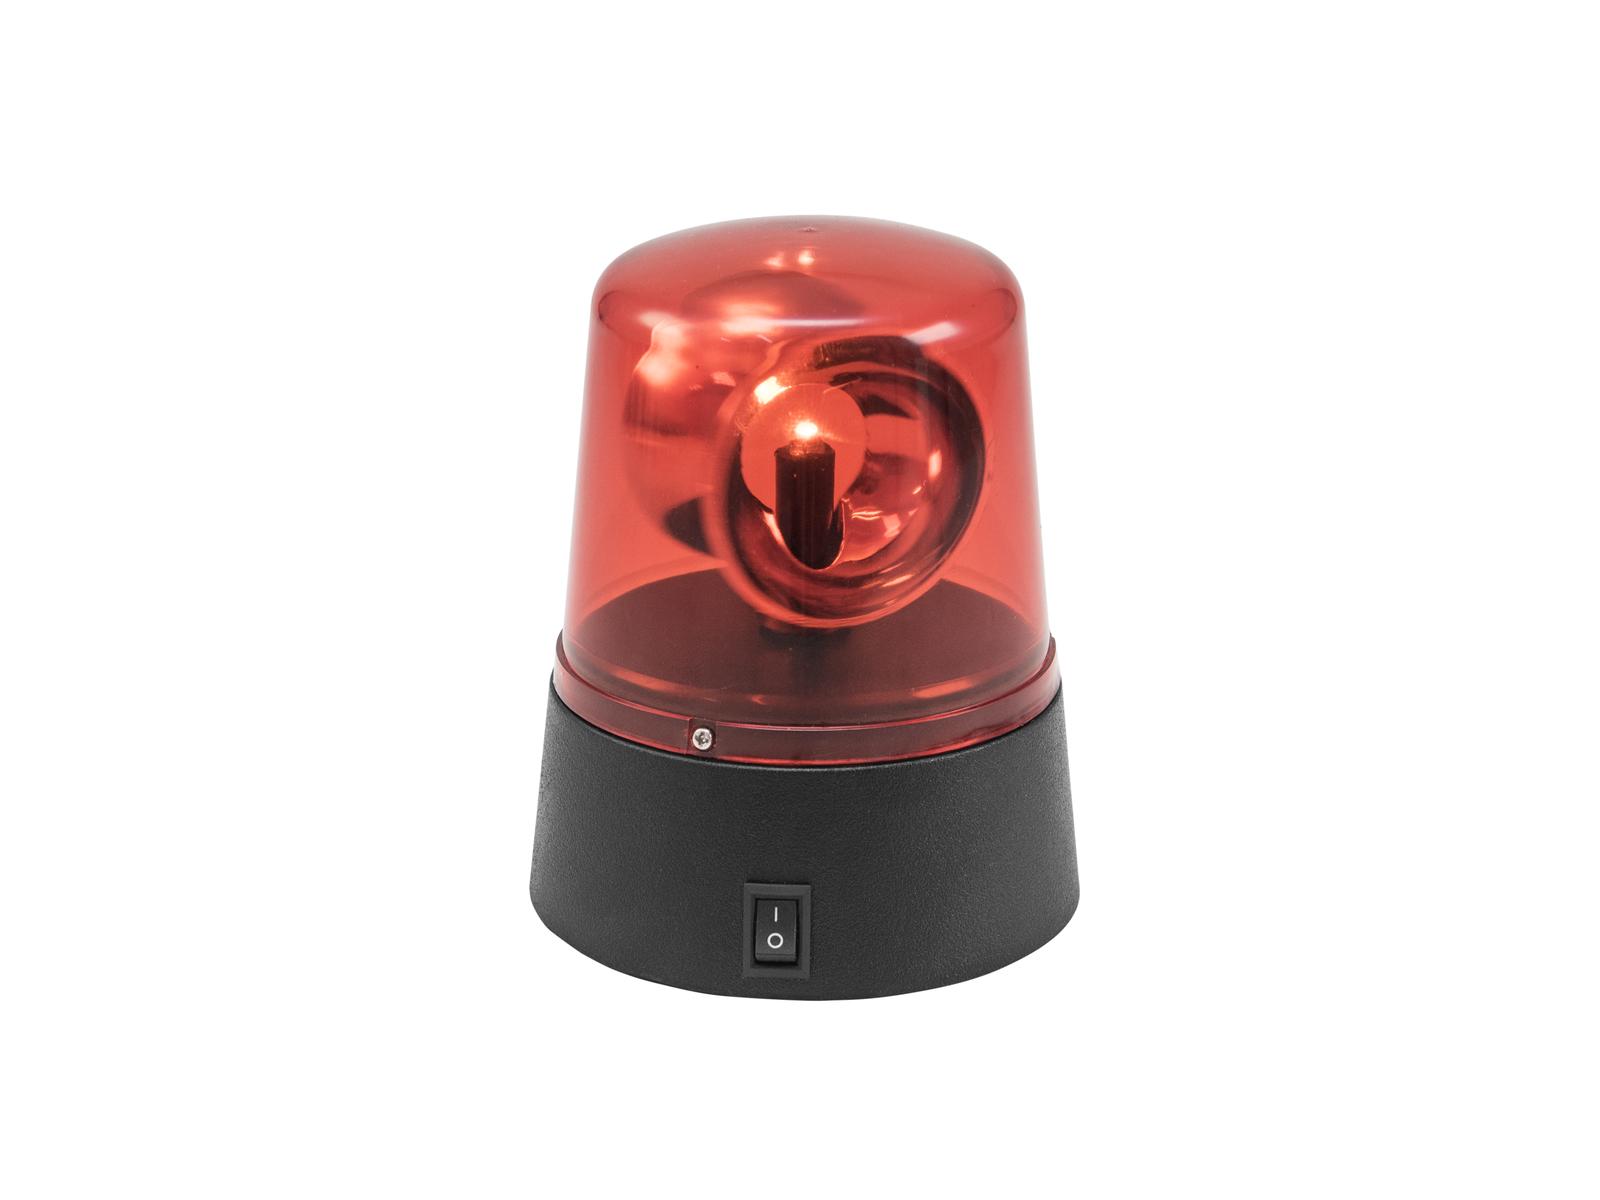 Eurolite LED mini policejní maják, červený